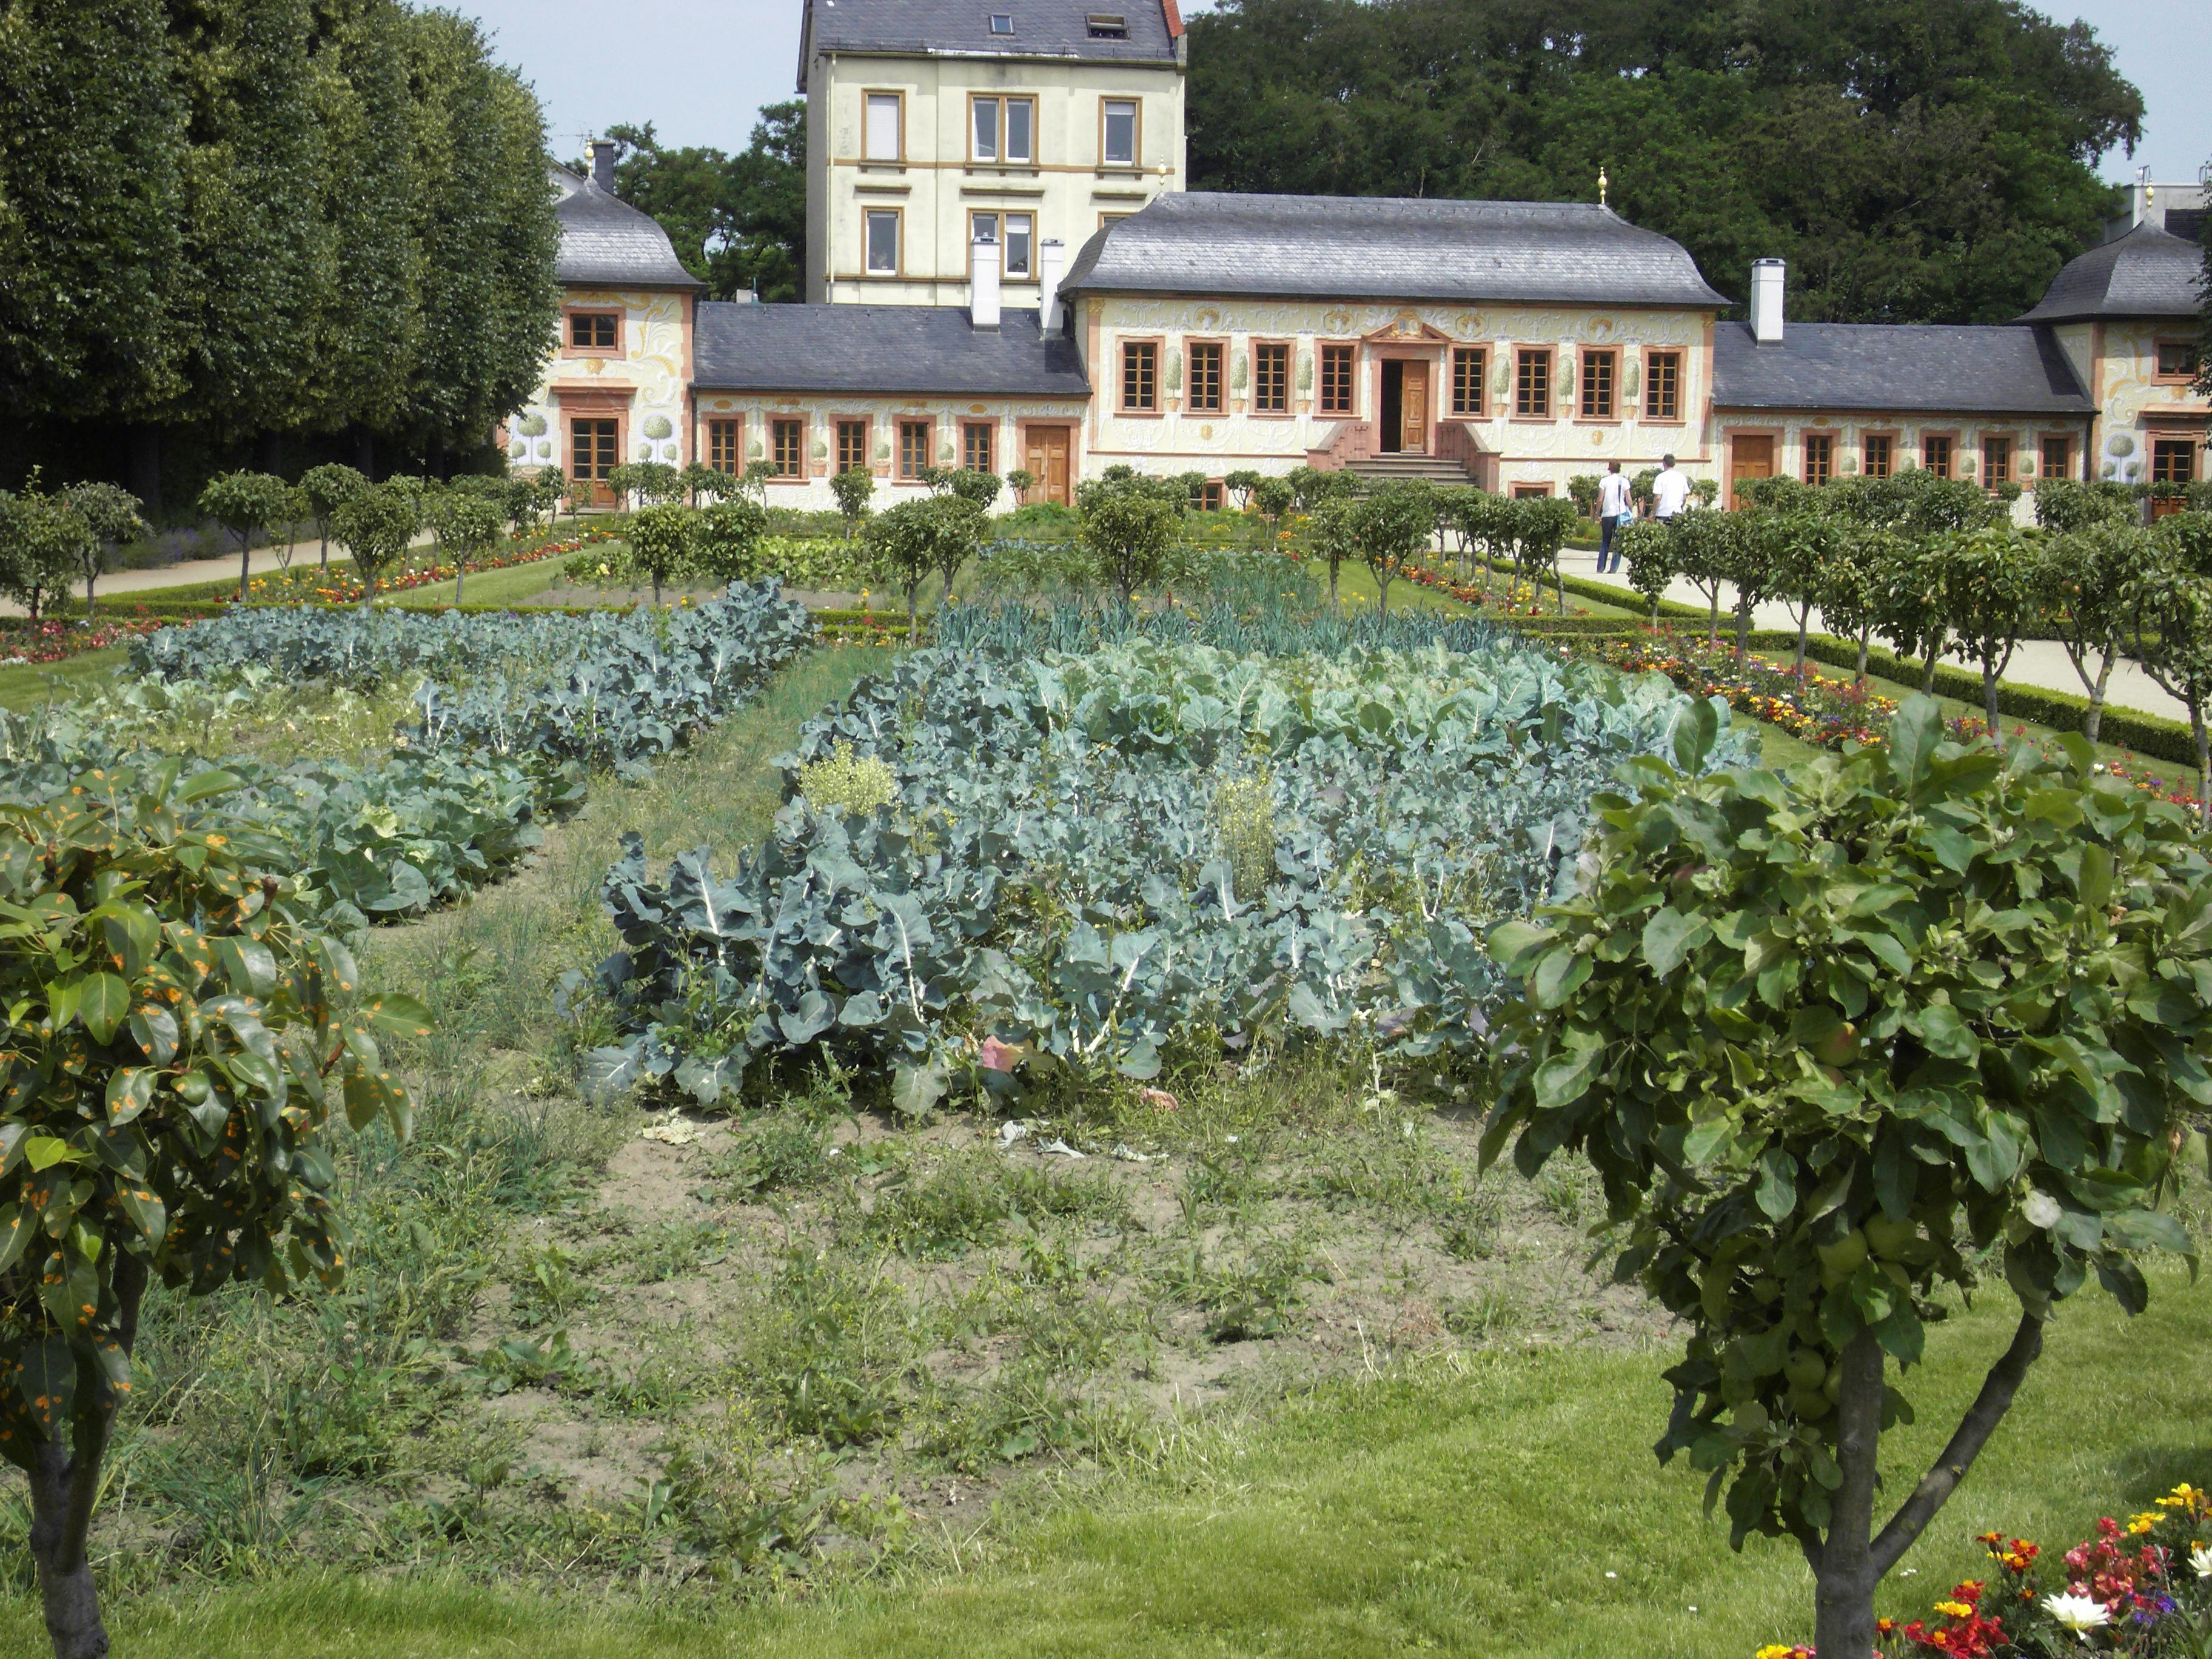 File Gemuesegarten Im Prinz Georg Garten Darmstadt Wikimedia